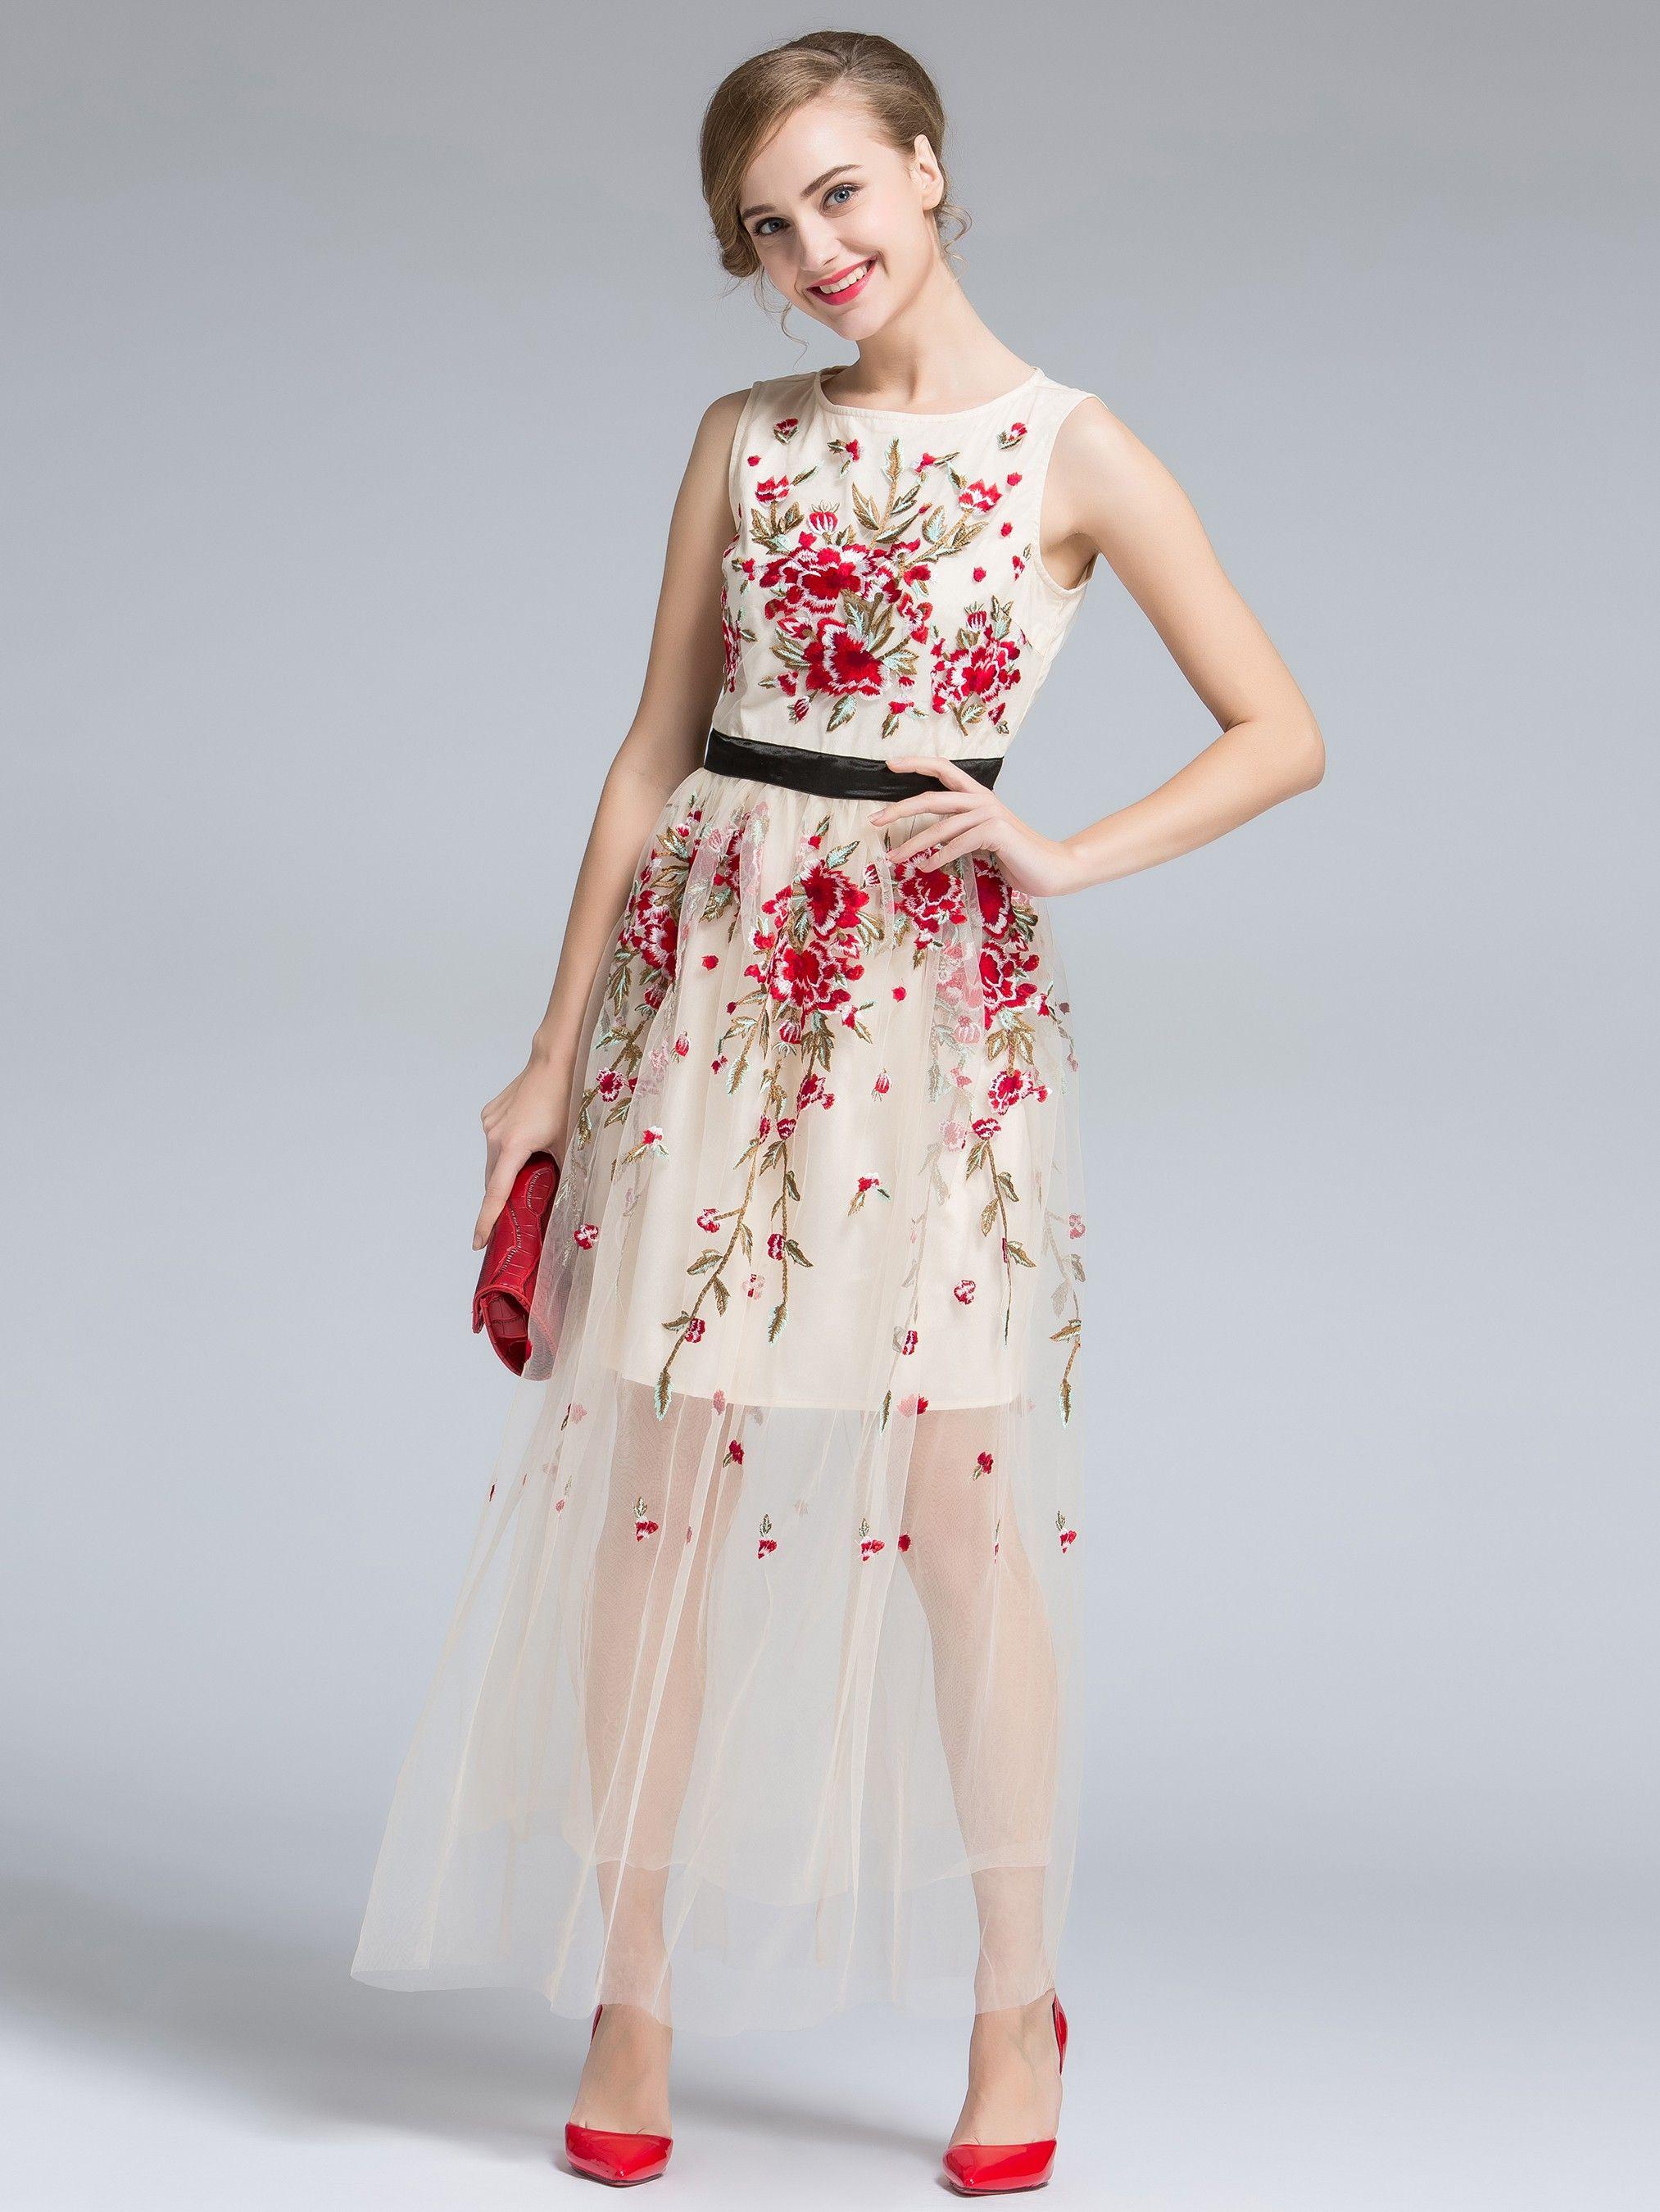 992994966042c4 NapSwan- Apricot Resort Silk Embroidery Sleeveless See-Through Maxi Dress -  NapSwan